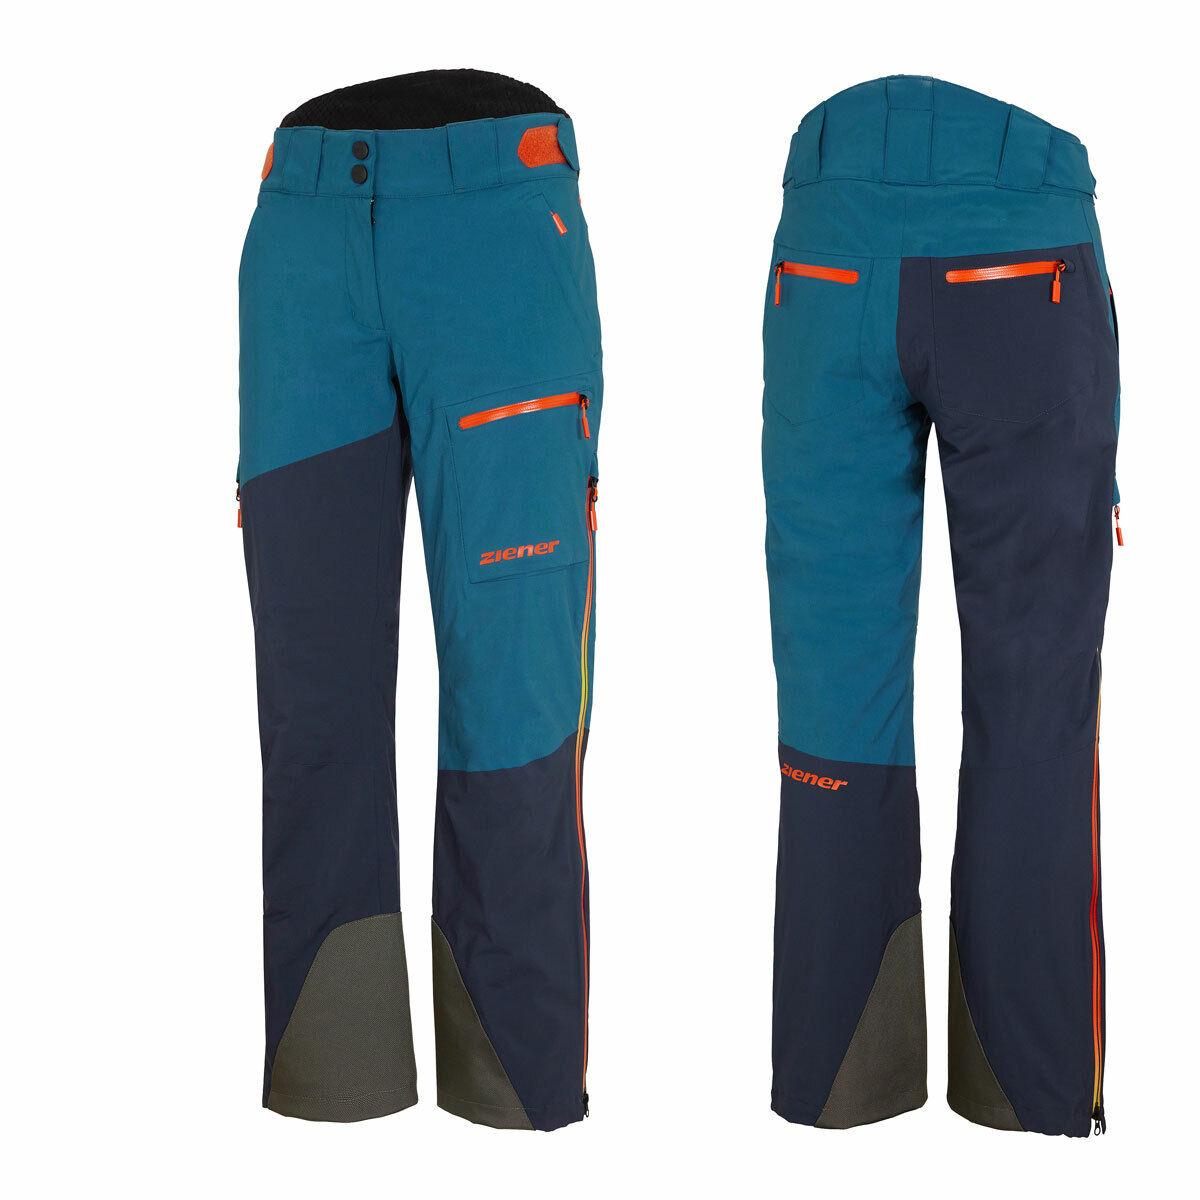 ZIENER TILAS VENT-ZIP LADY Damen Skihose Snowboardhose TEAMWEAR 20K 184938